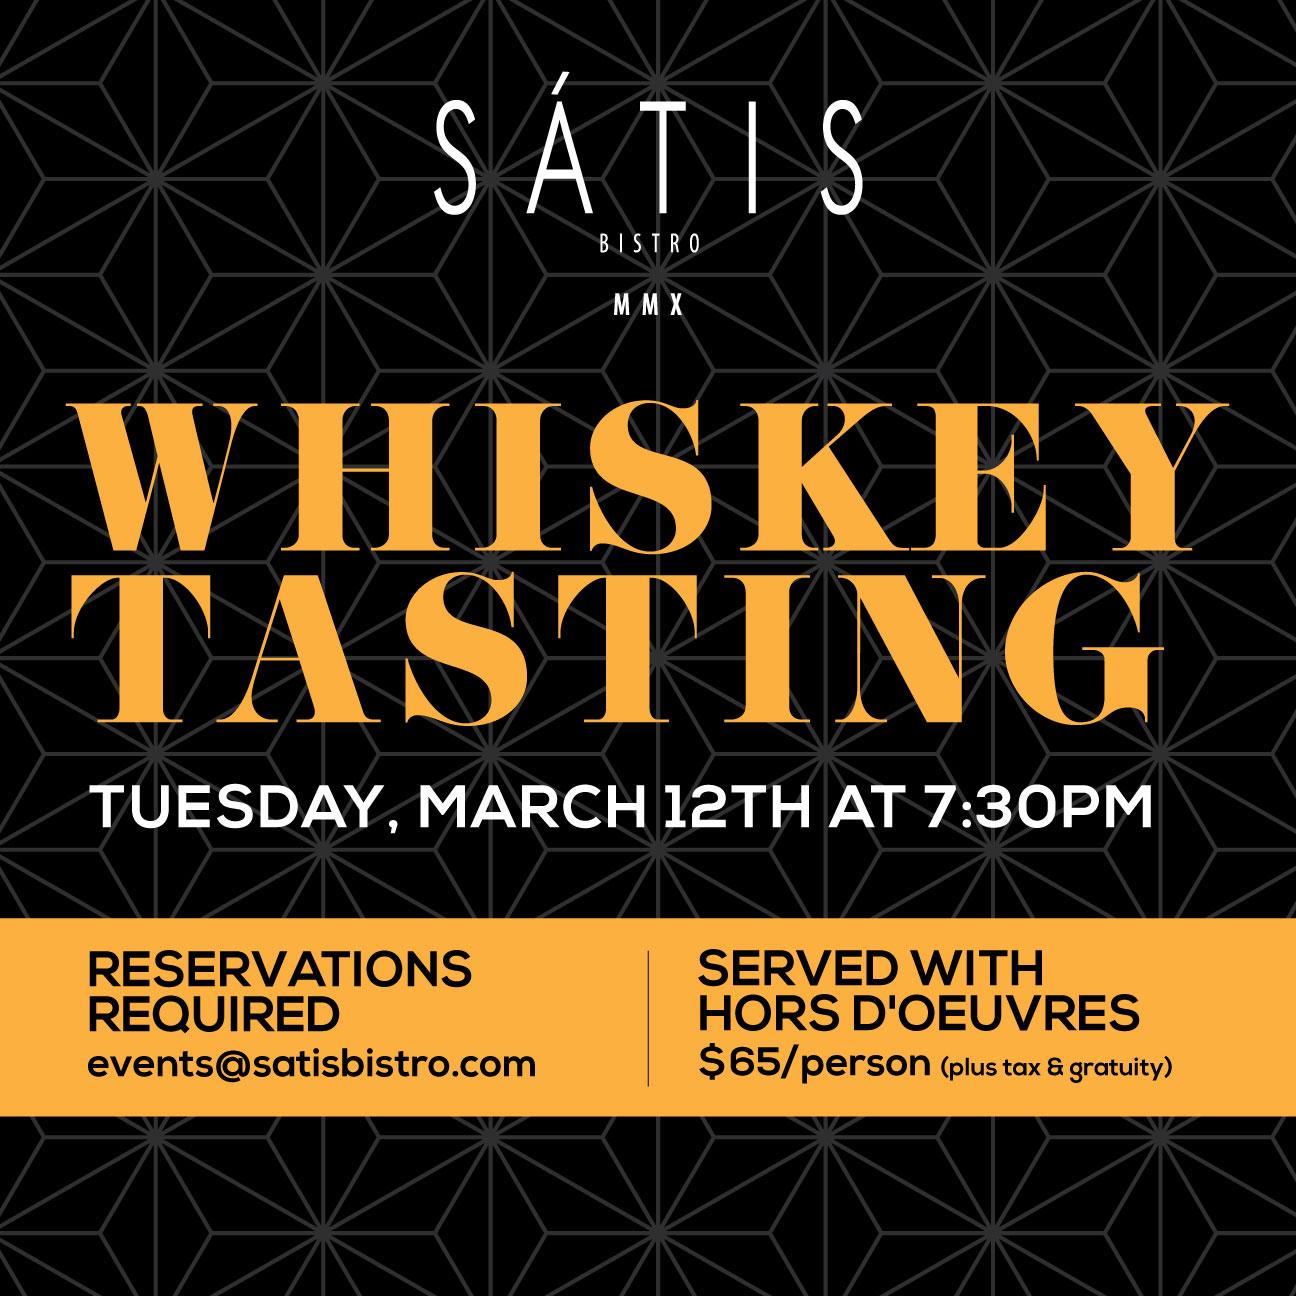 Satis Bistro Whiskey Tasting